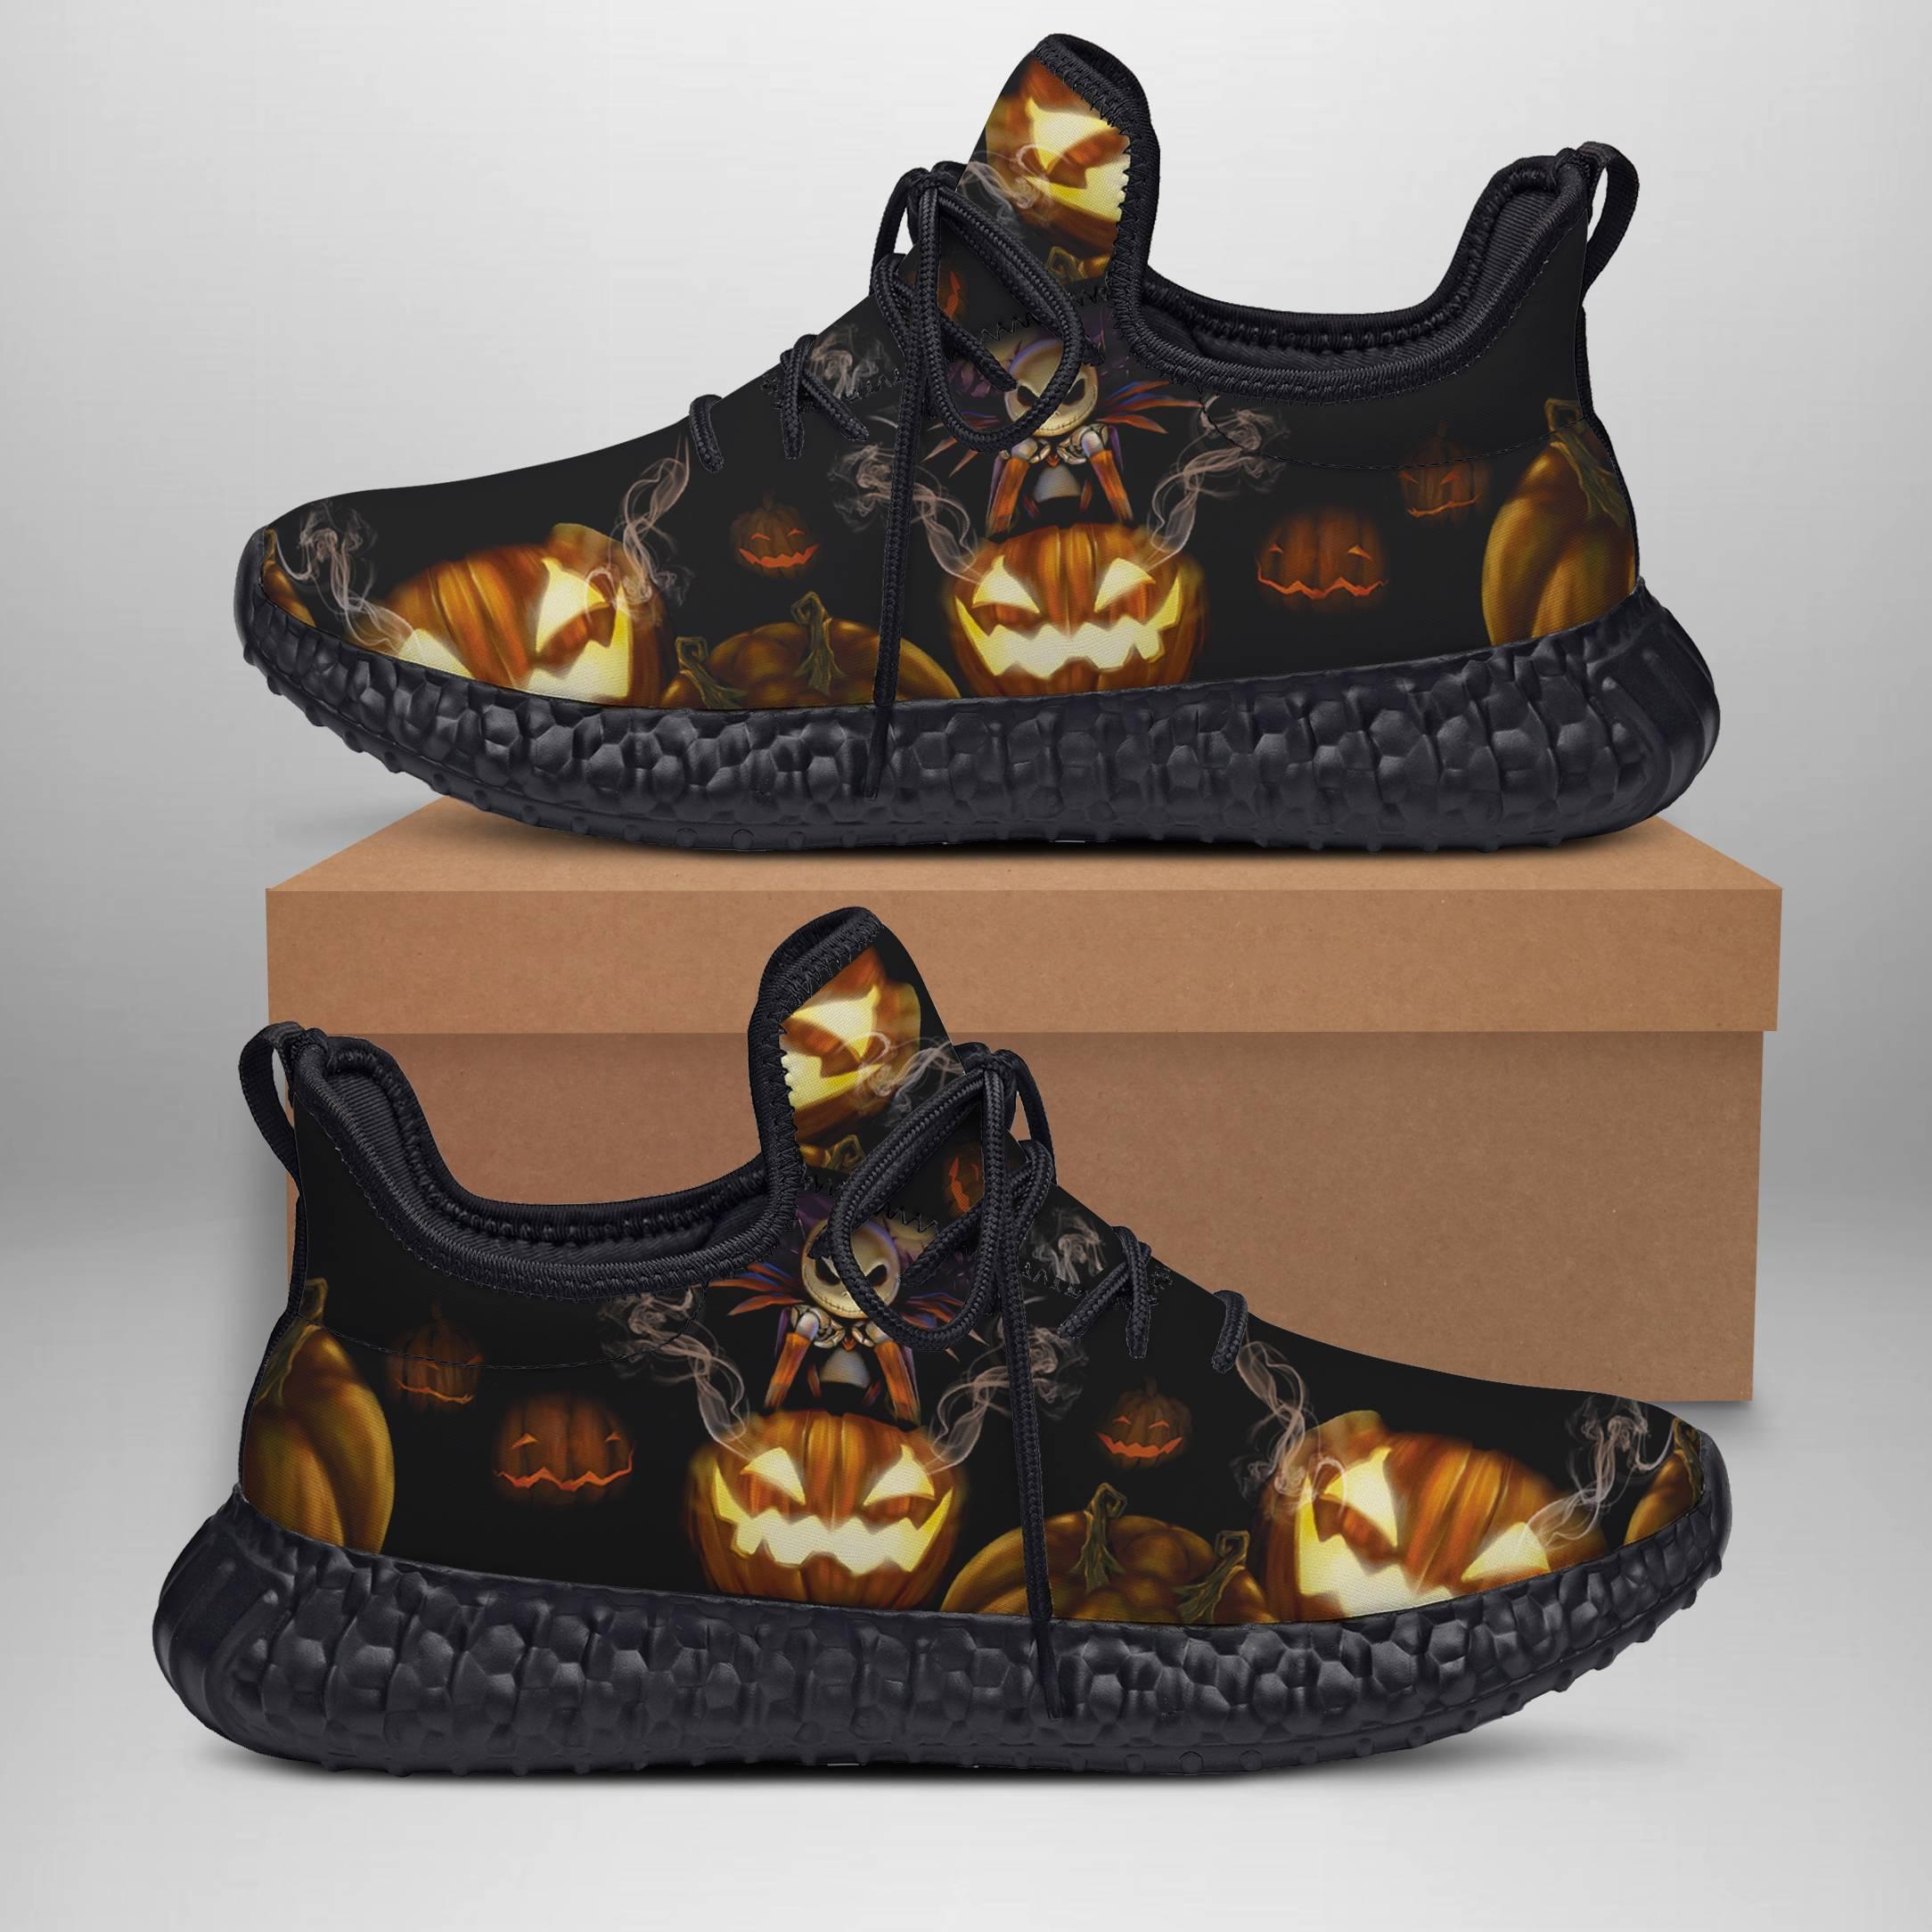 JACK SKELLINGTON  Yeezy Sneakers Shoes For Men, Women, Runing Yeezy Sneakers Shoes. Custom Yeezy Sneakers Shoes SNEAKERS